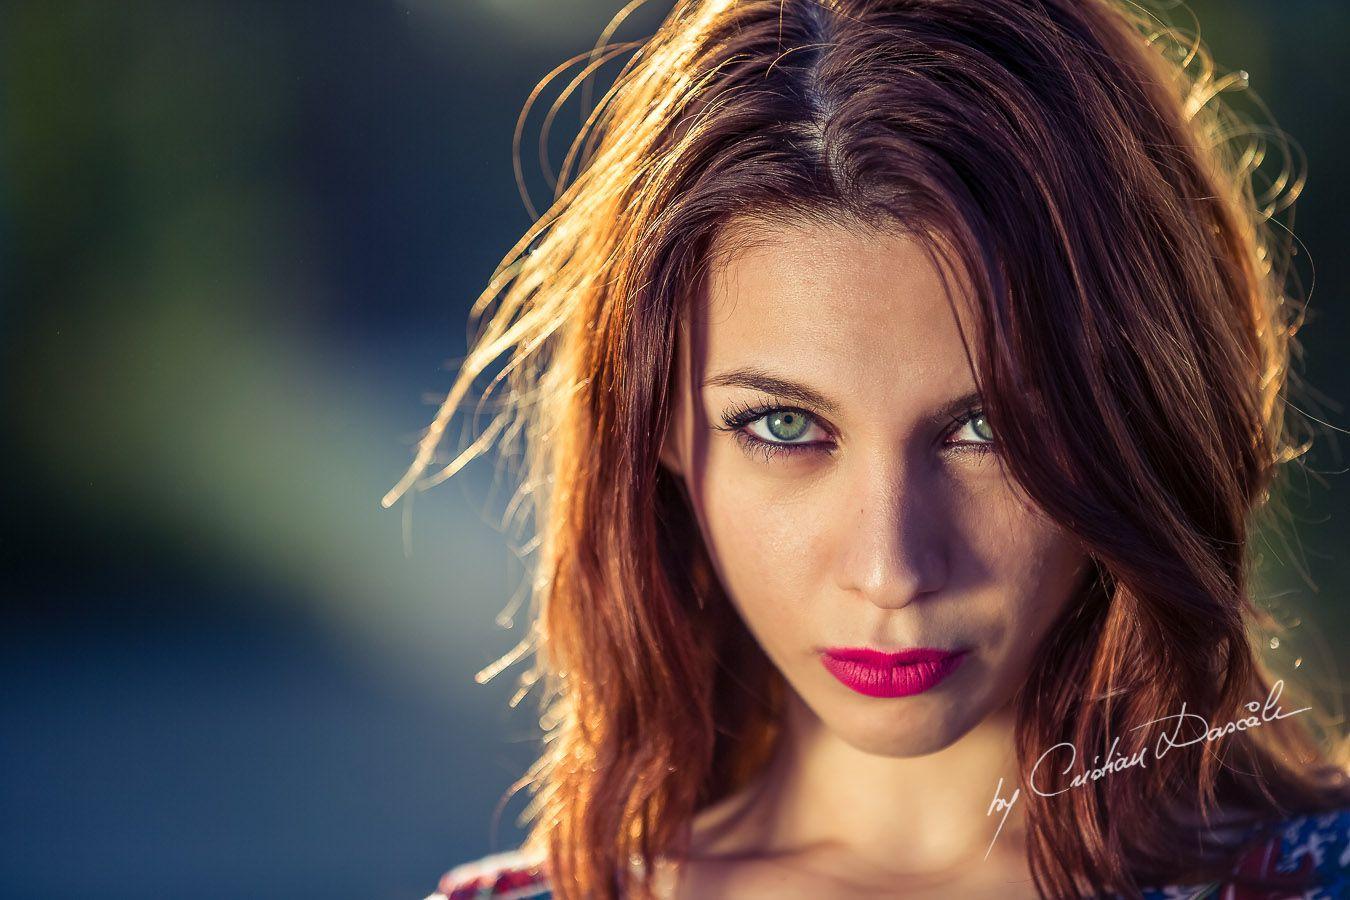 Portrait Photography in Cyprus - Cristian Dascalu